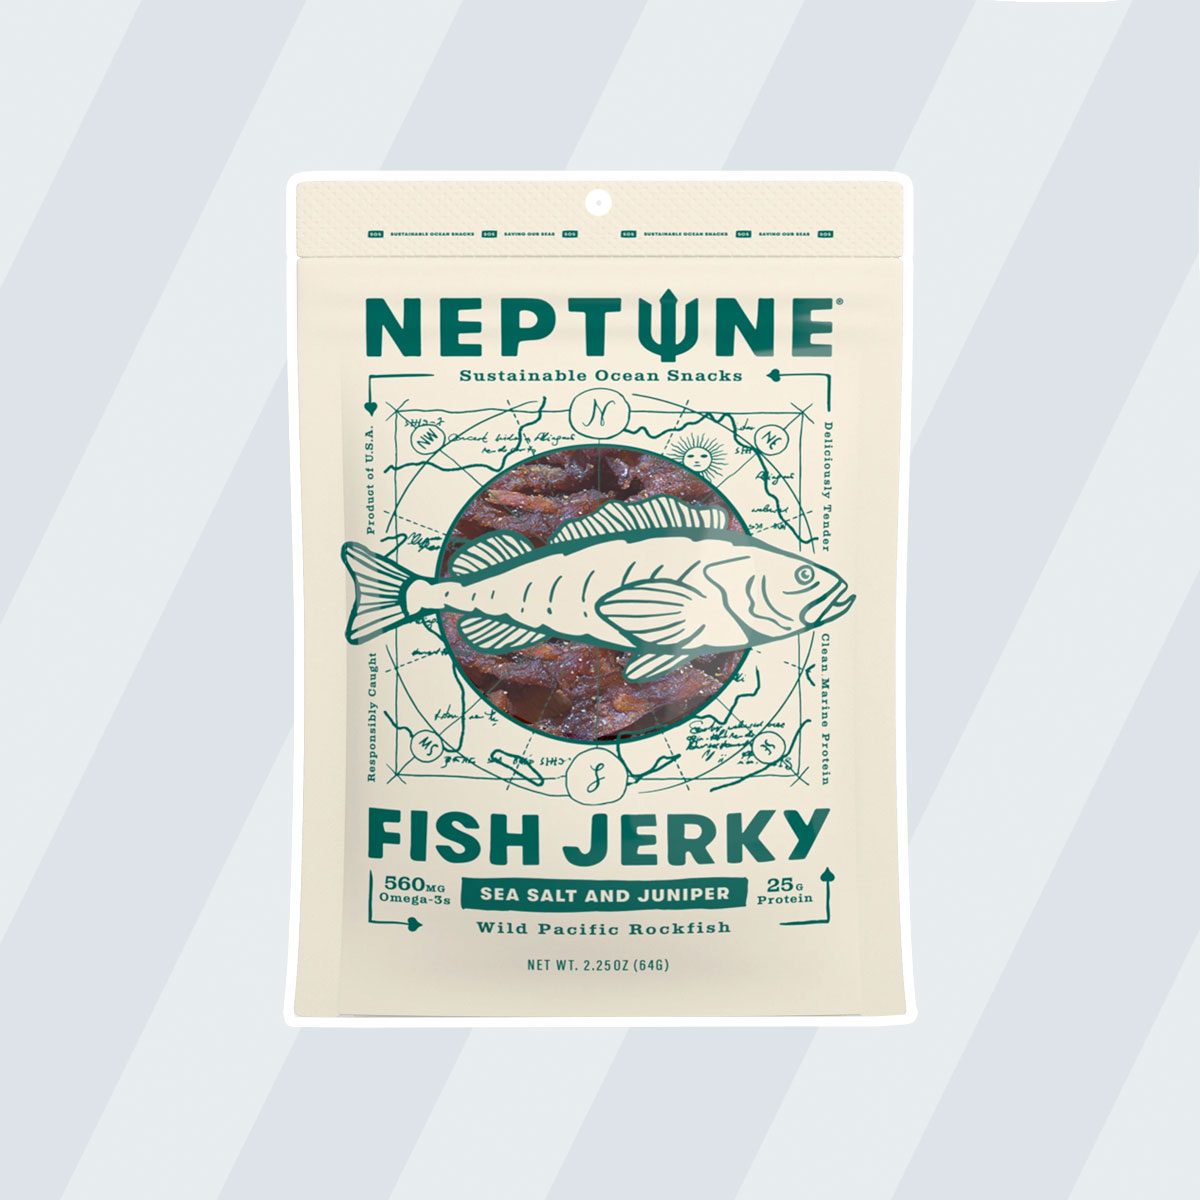 healthy snacks to buy Neptune White Fish Jerky